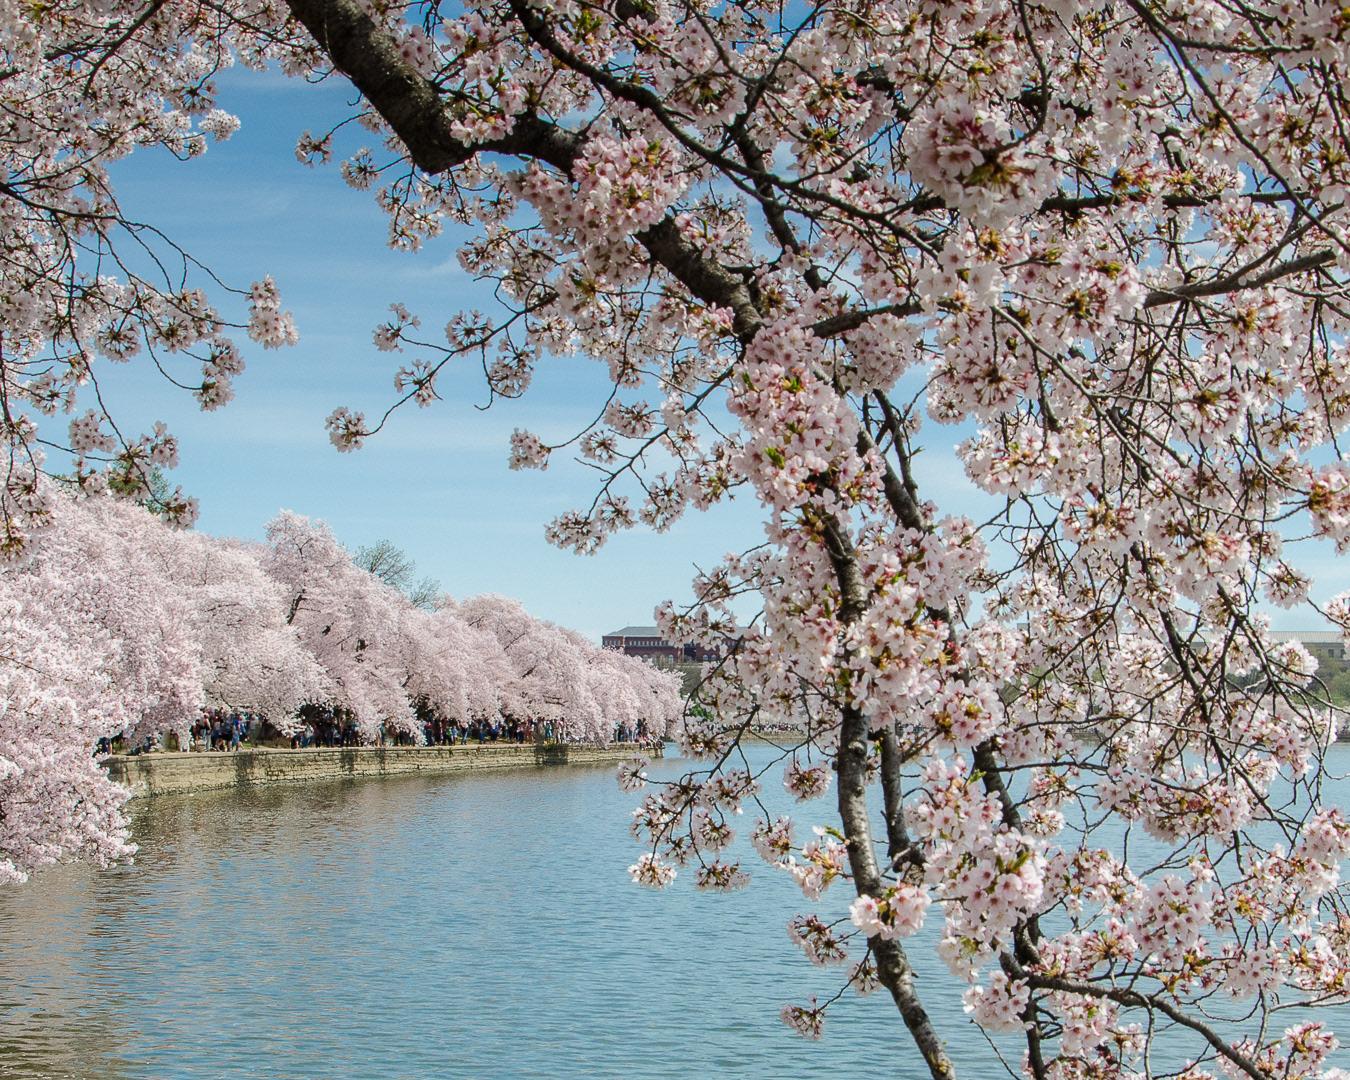 cherry blossom festival - HD1350×1080